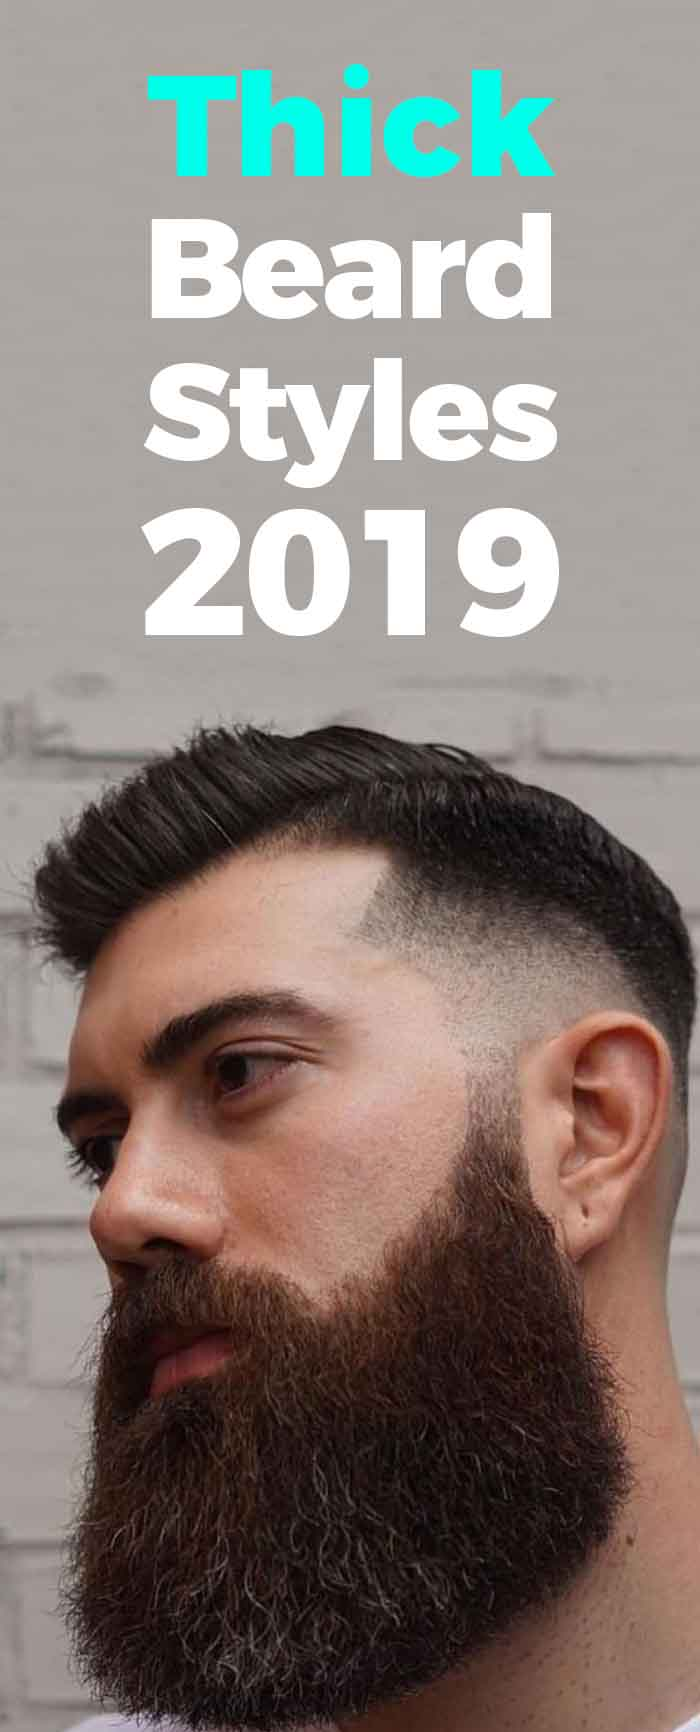 Popular thick beard style for men!